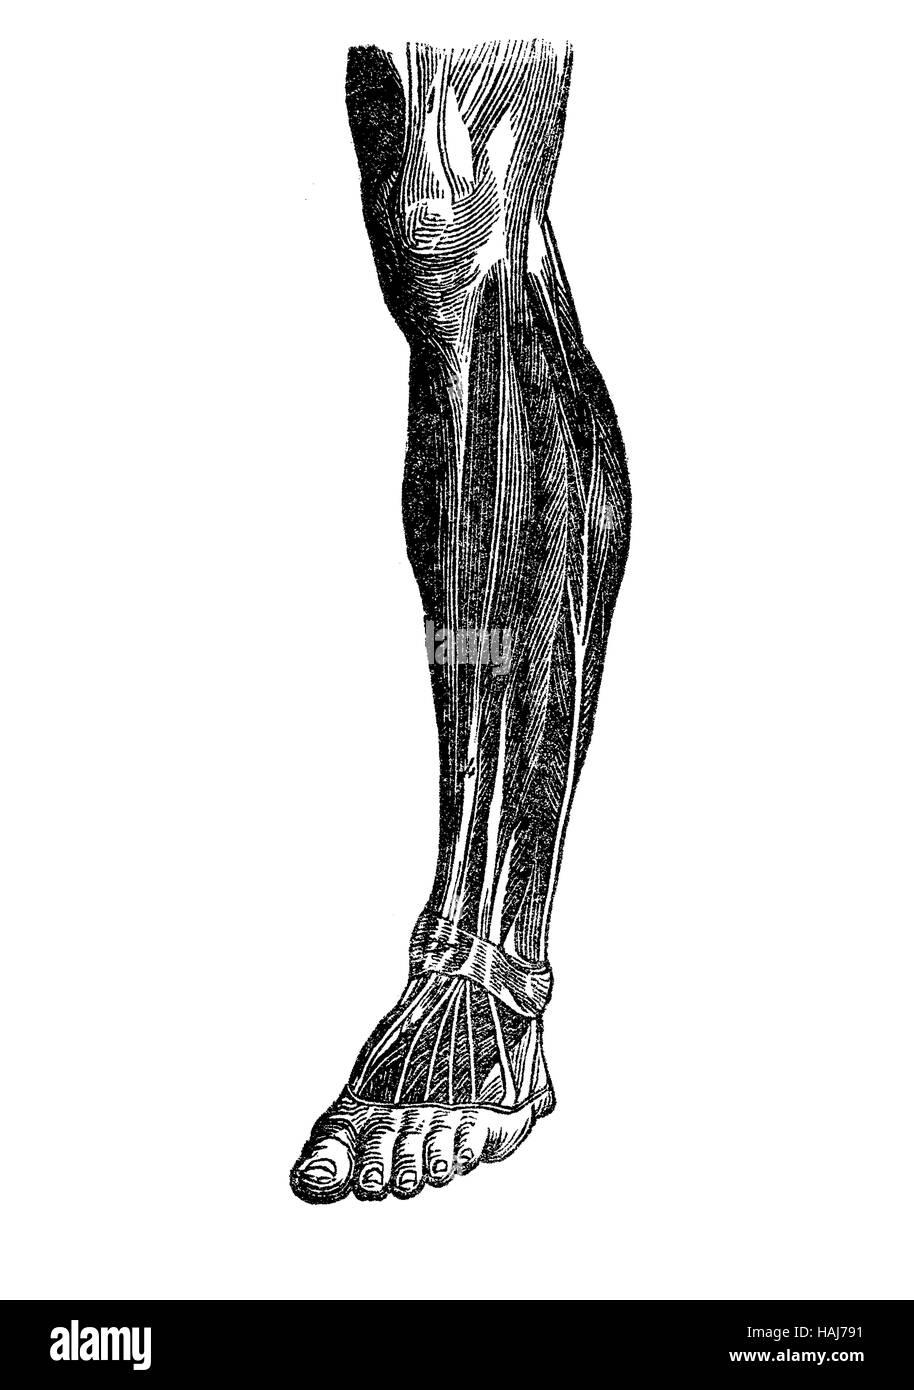 Human foot anatomy stock photos human foot anatomy stock images anatomy human musculature foot shankknee stock image pooptronica